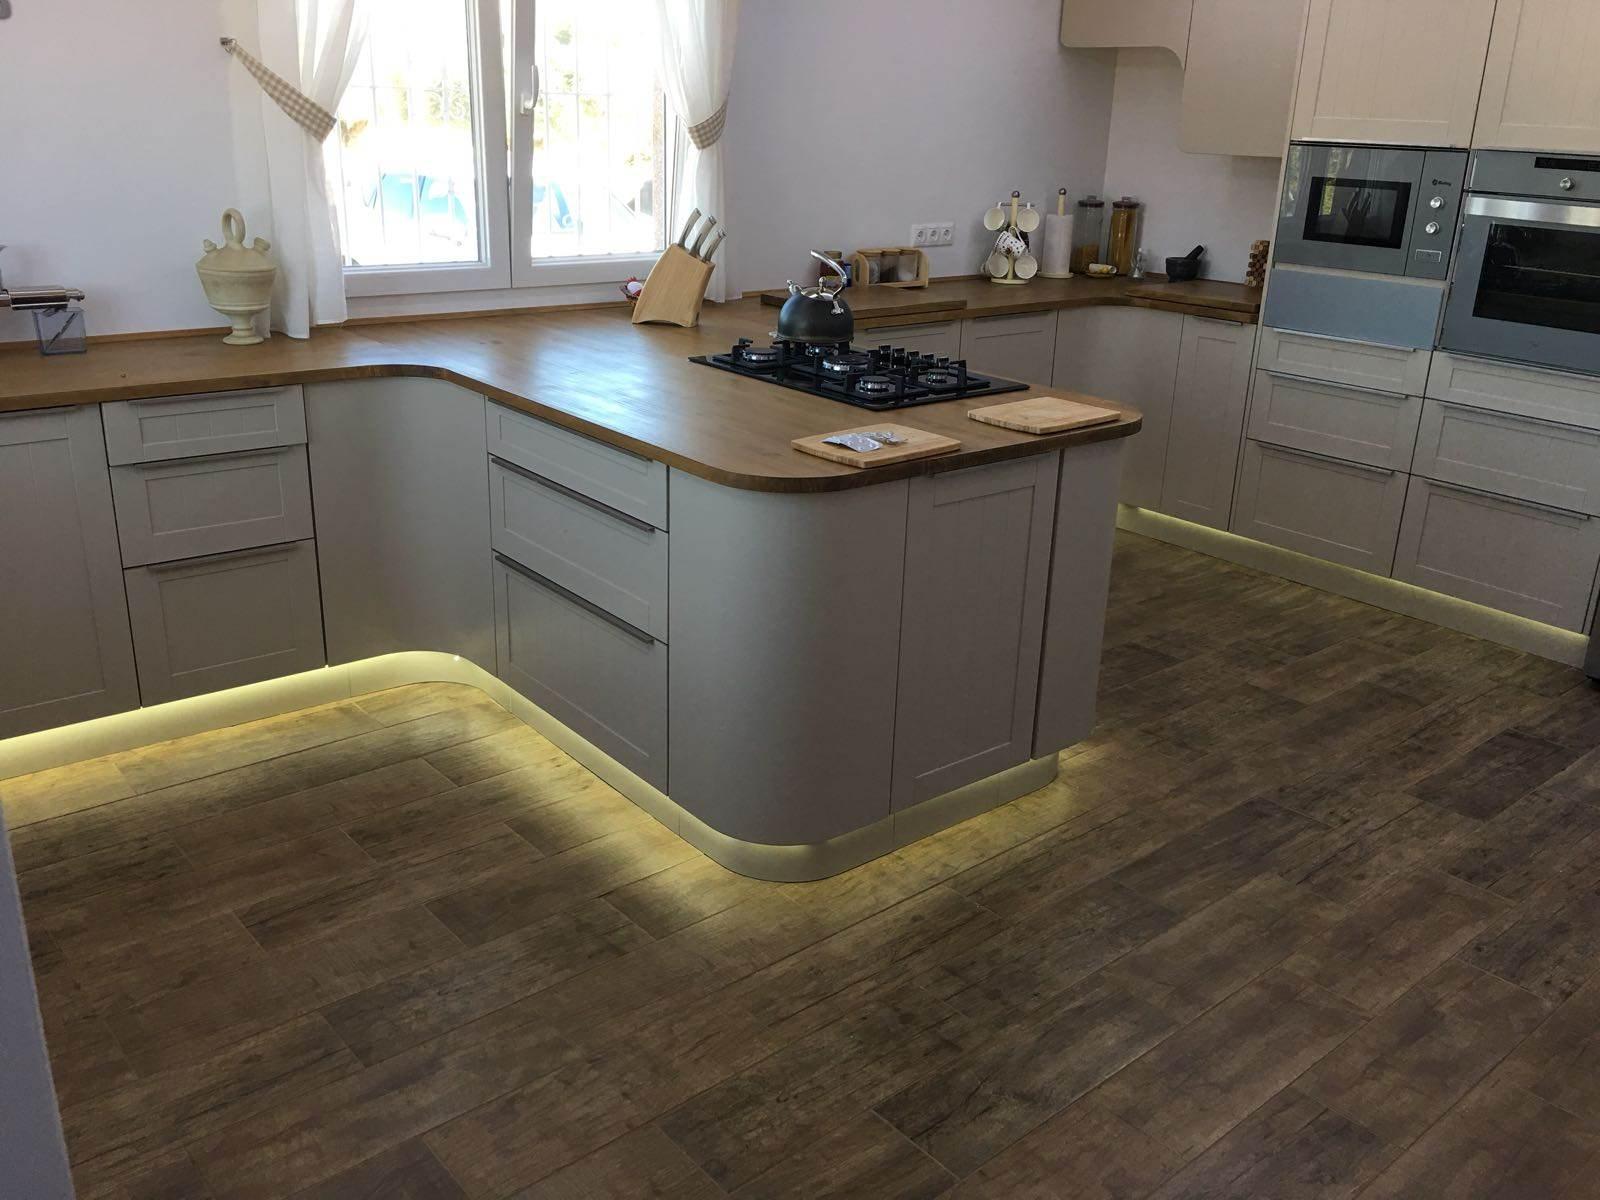 full-kitchen-renovation-leddy-contractors-12